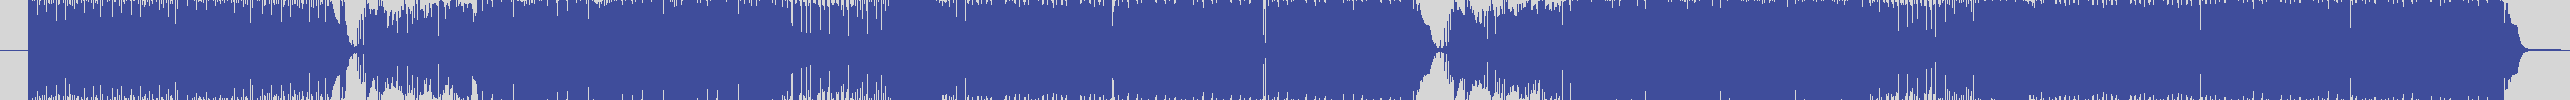 hitaly_muzik [smile1057] Giulio Lanteri - Ritmo Do Brazil [Original Mix] audio wave form